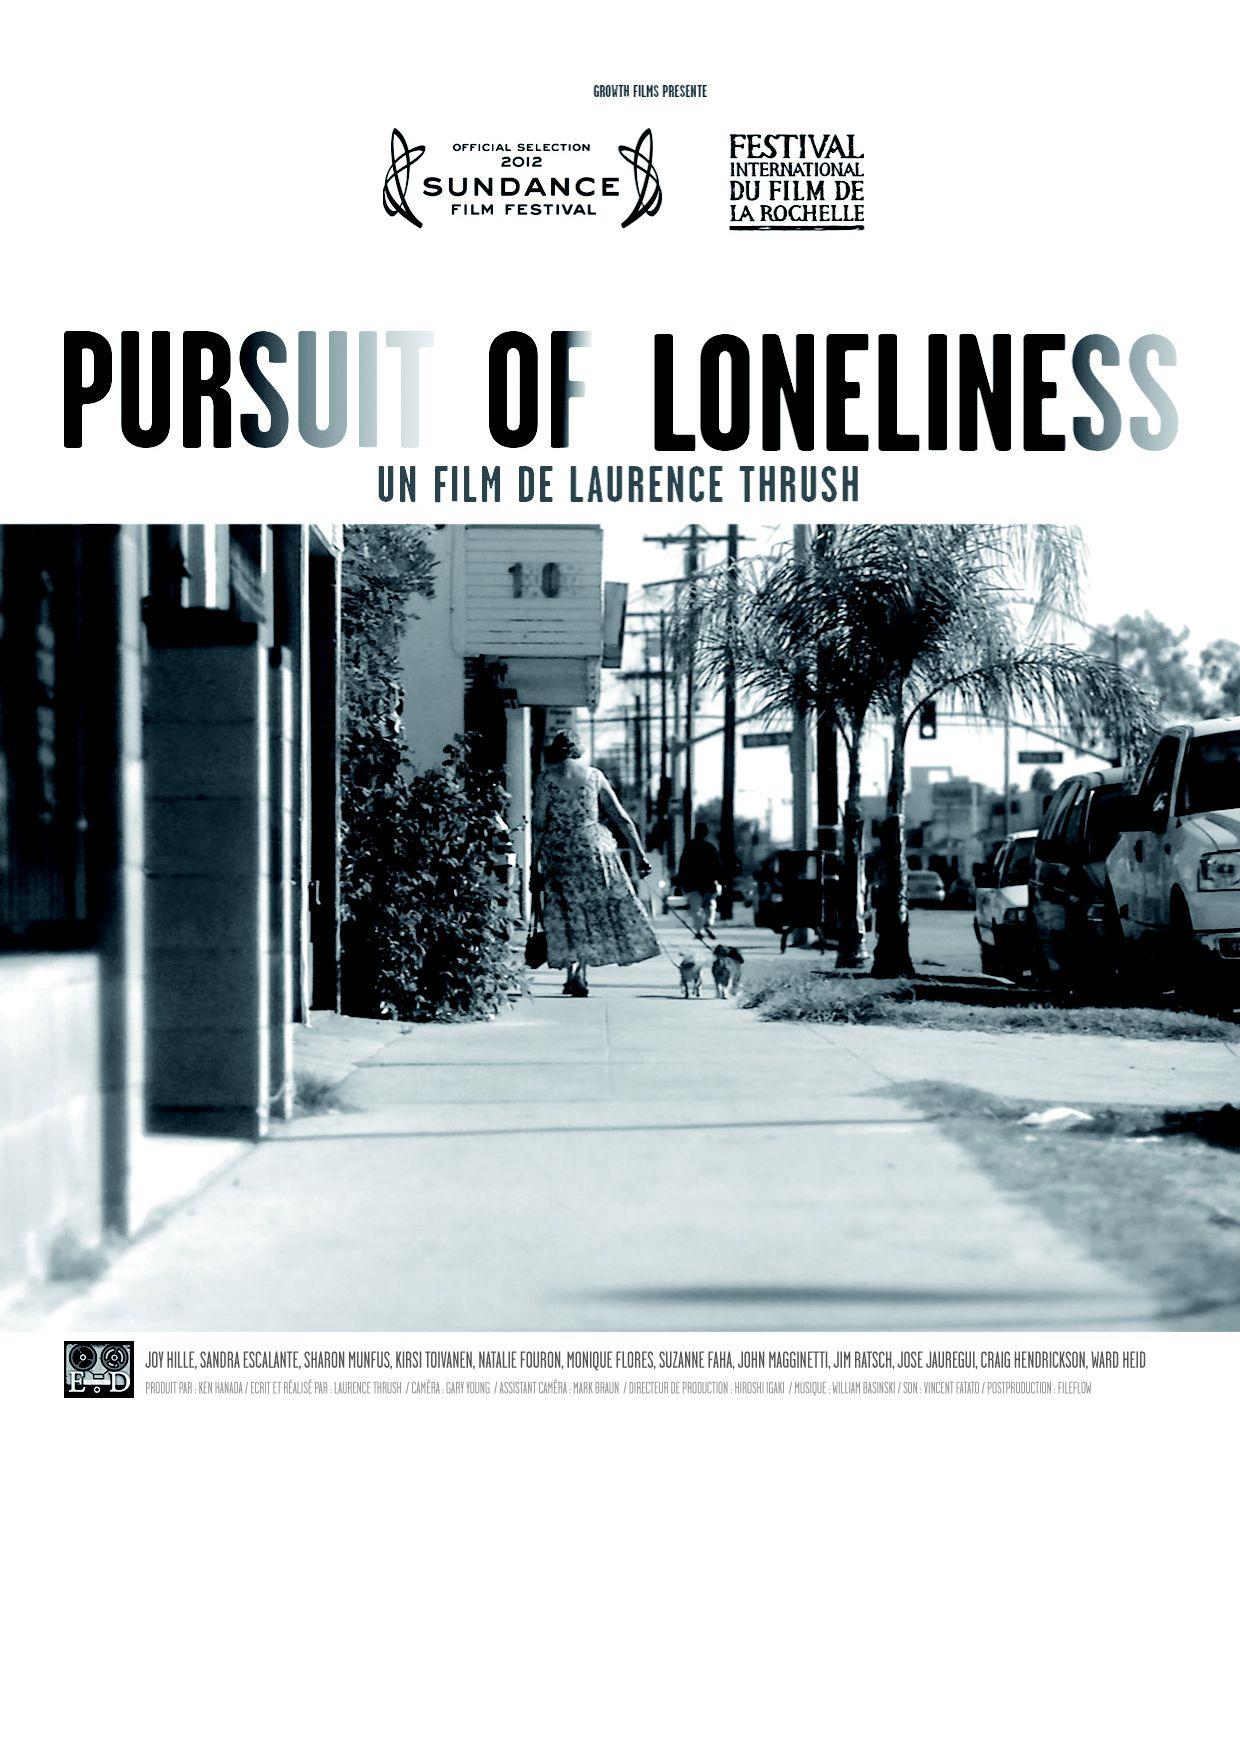 Pursuit of Loneliness - Film (2012)